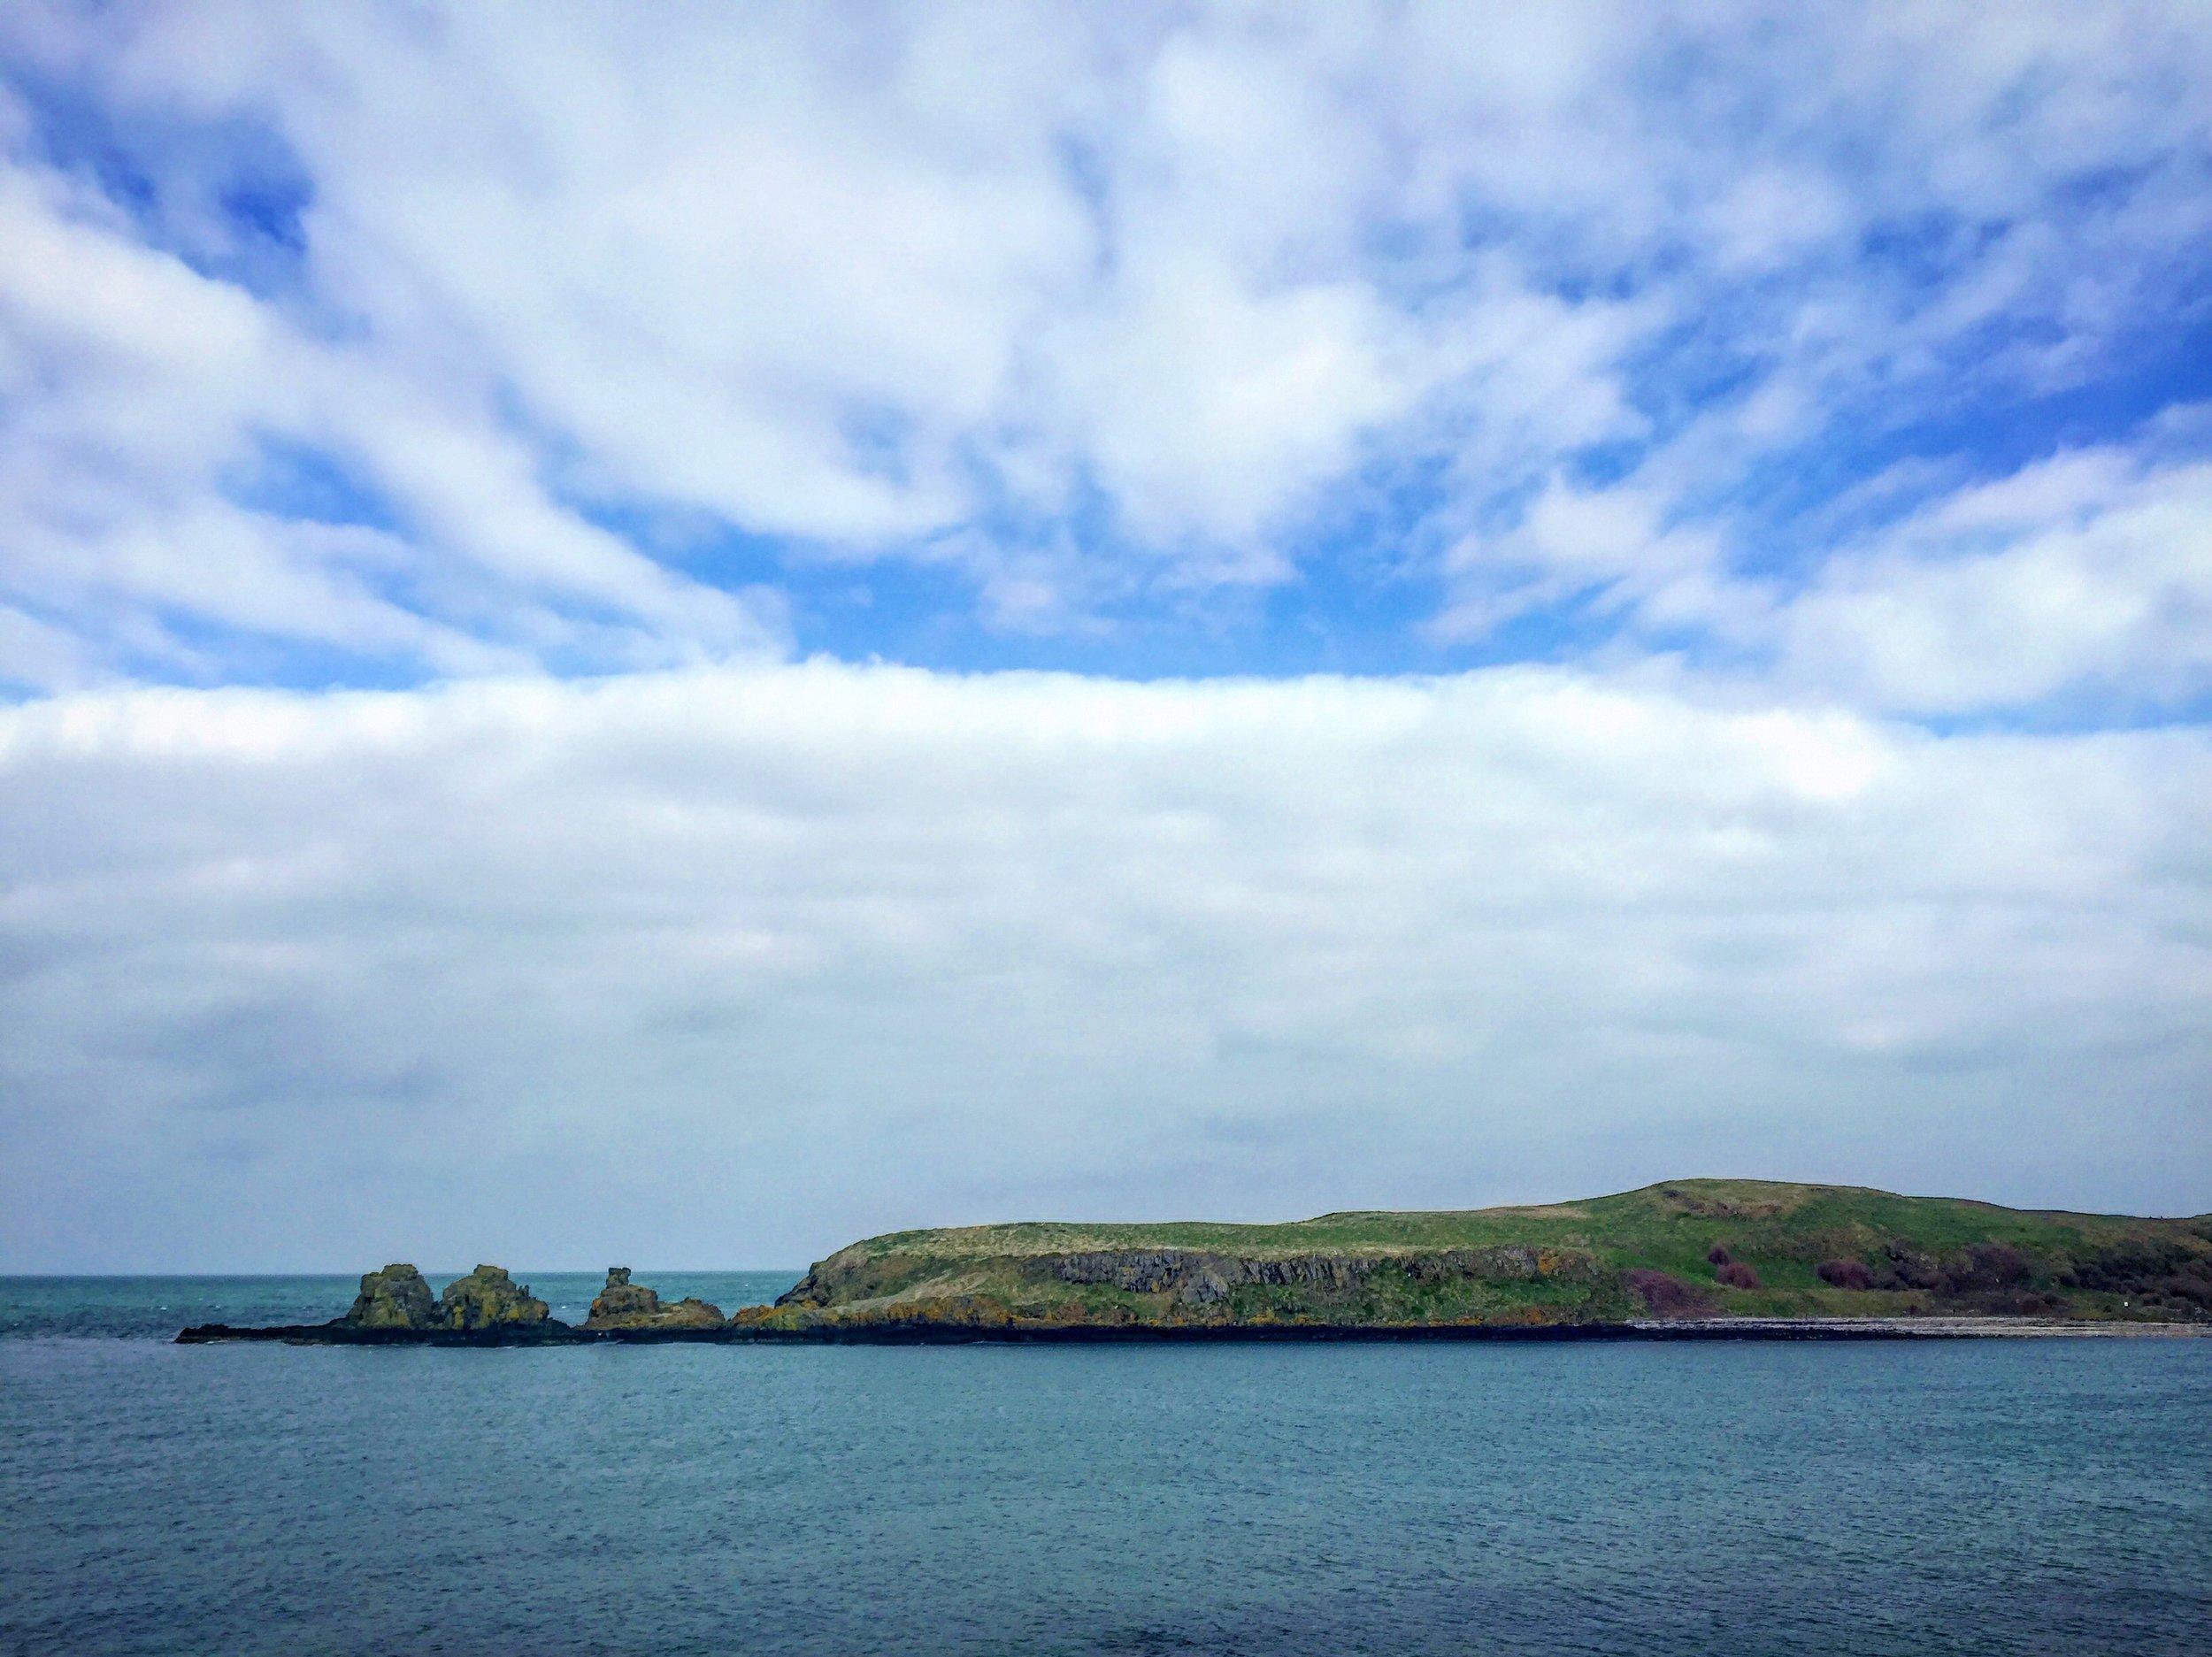 muck_island_portmuck_harbour_islandmagee_antrim_roadtrip_coast_ni_explorer_niexplorer_northern_ireland_blog.jpg